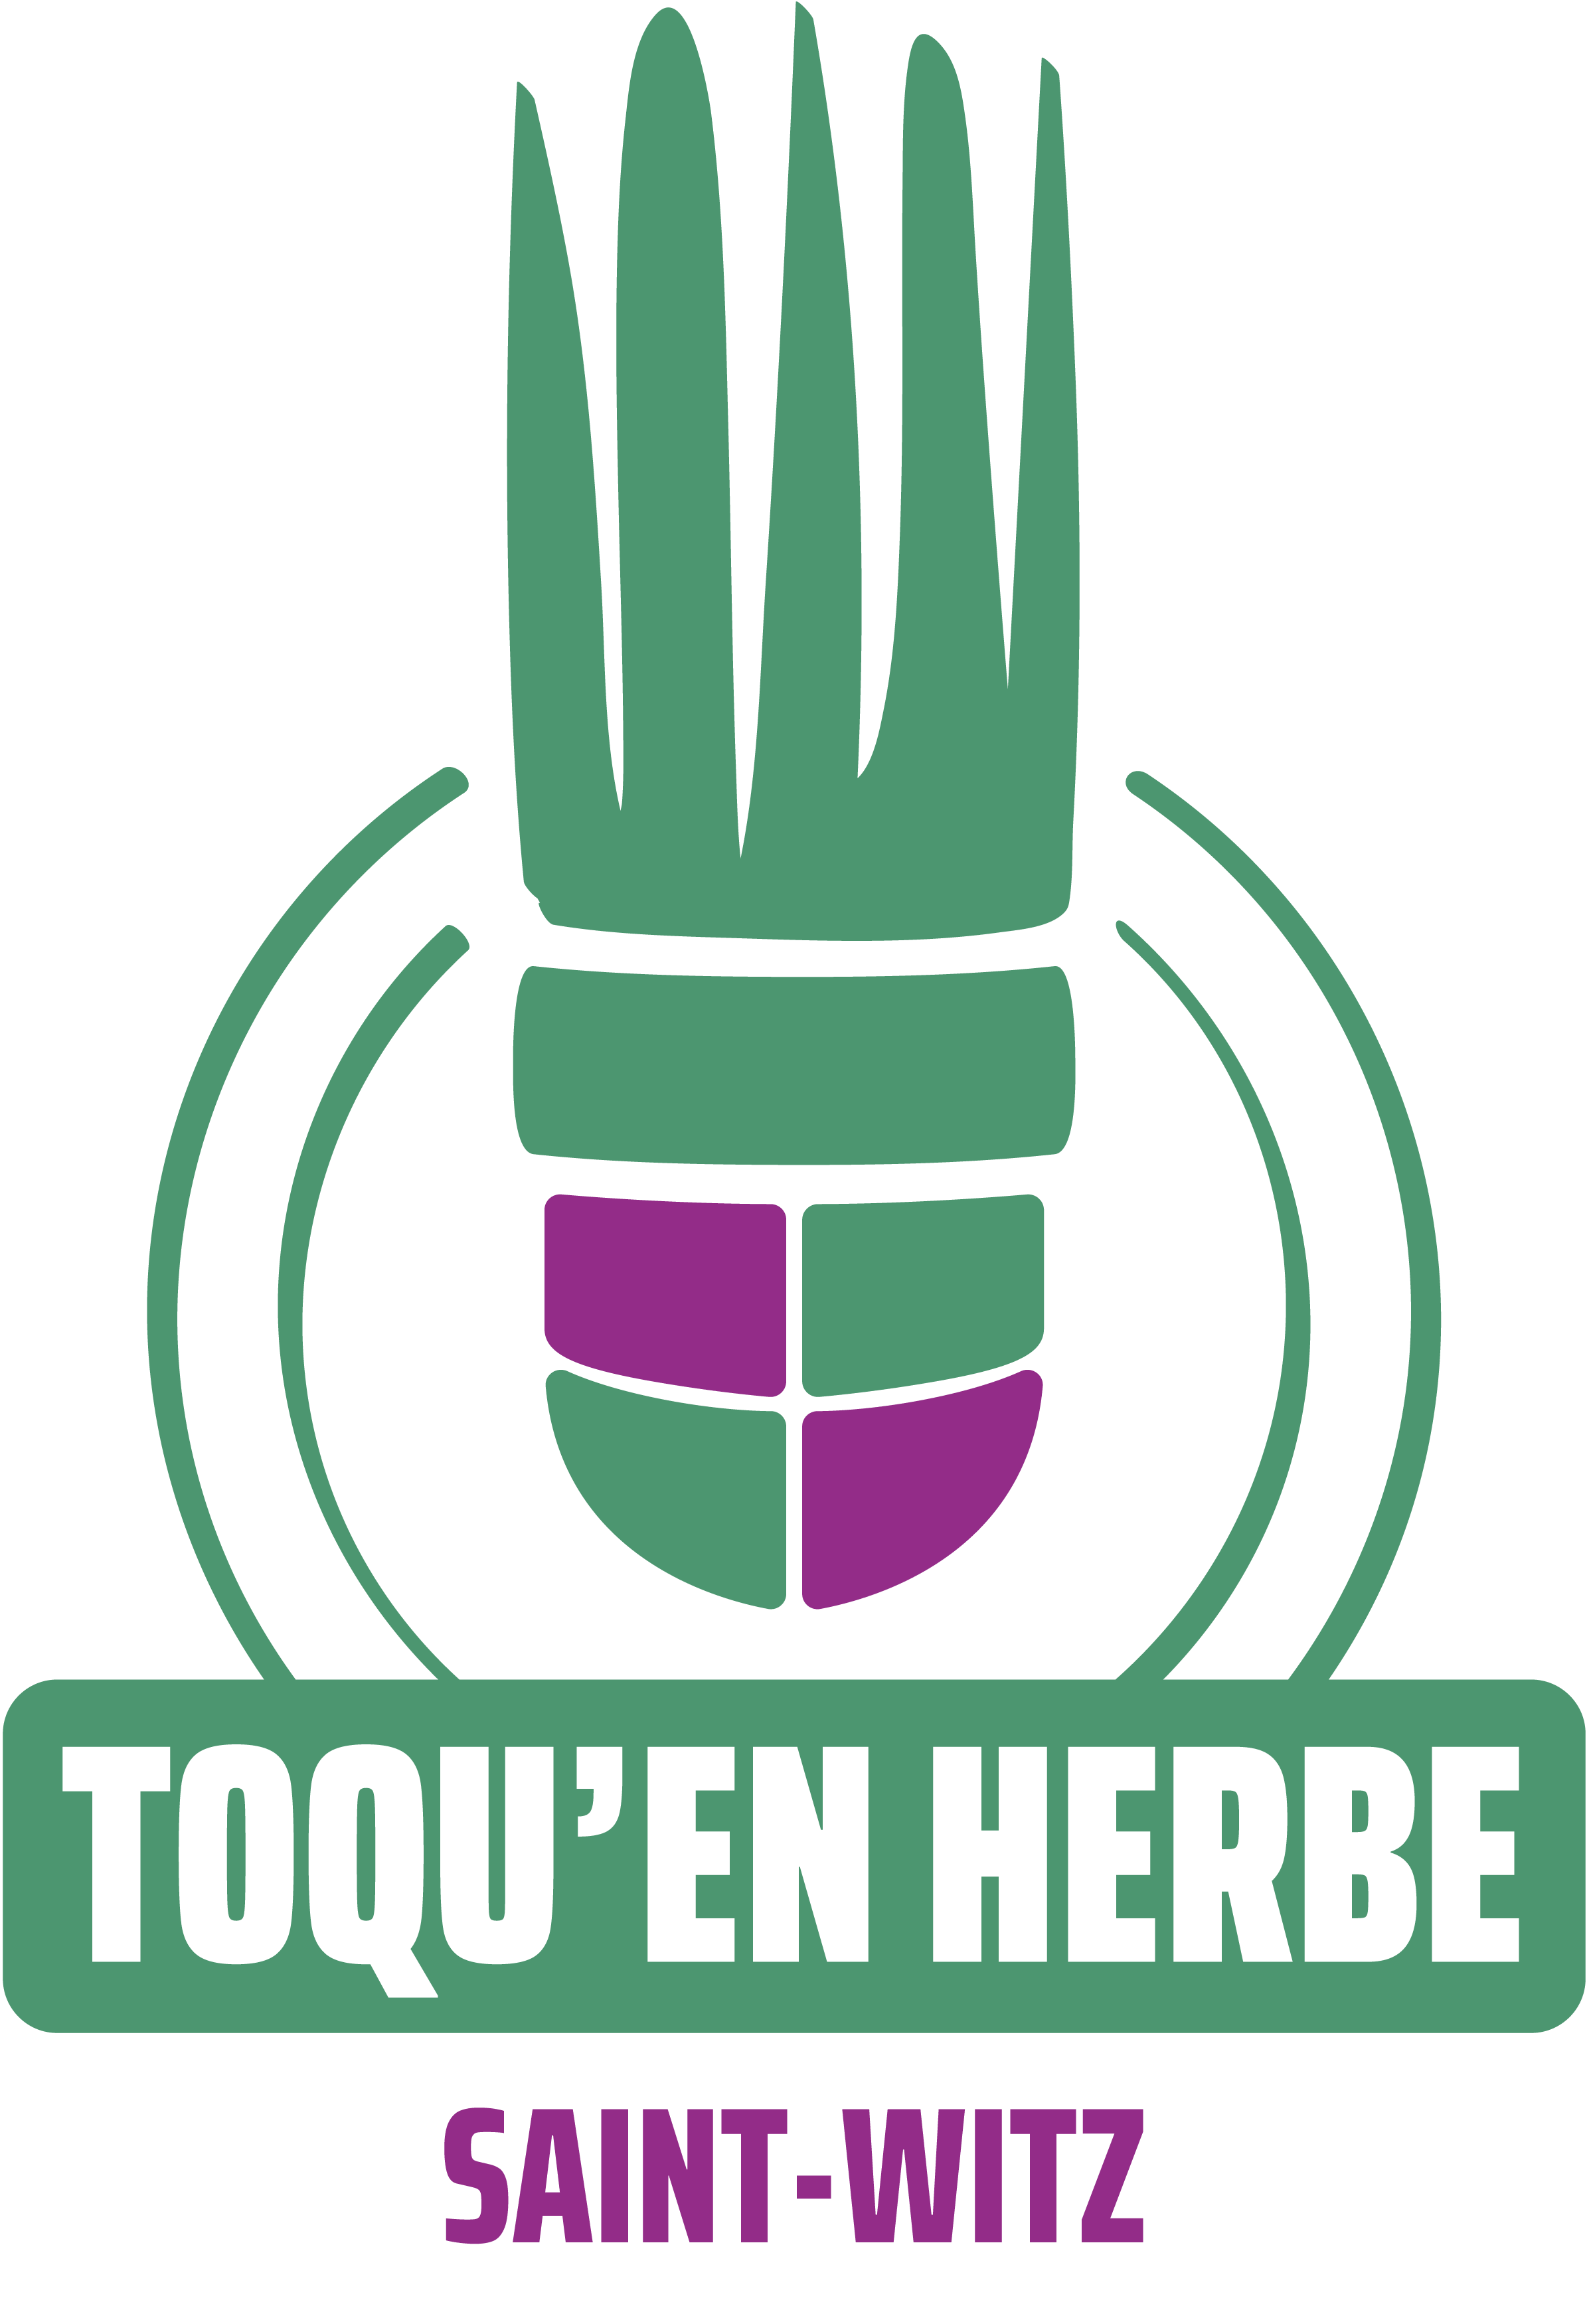 Logo Toquenherbe 2019 oh HD